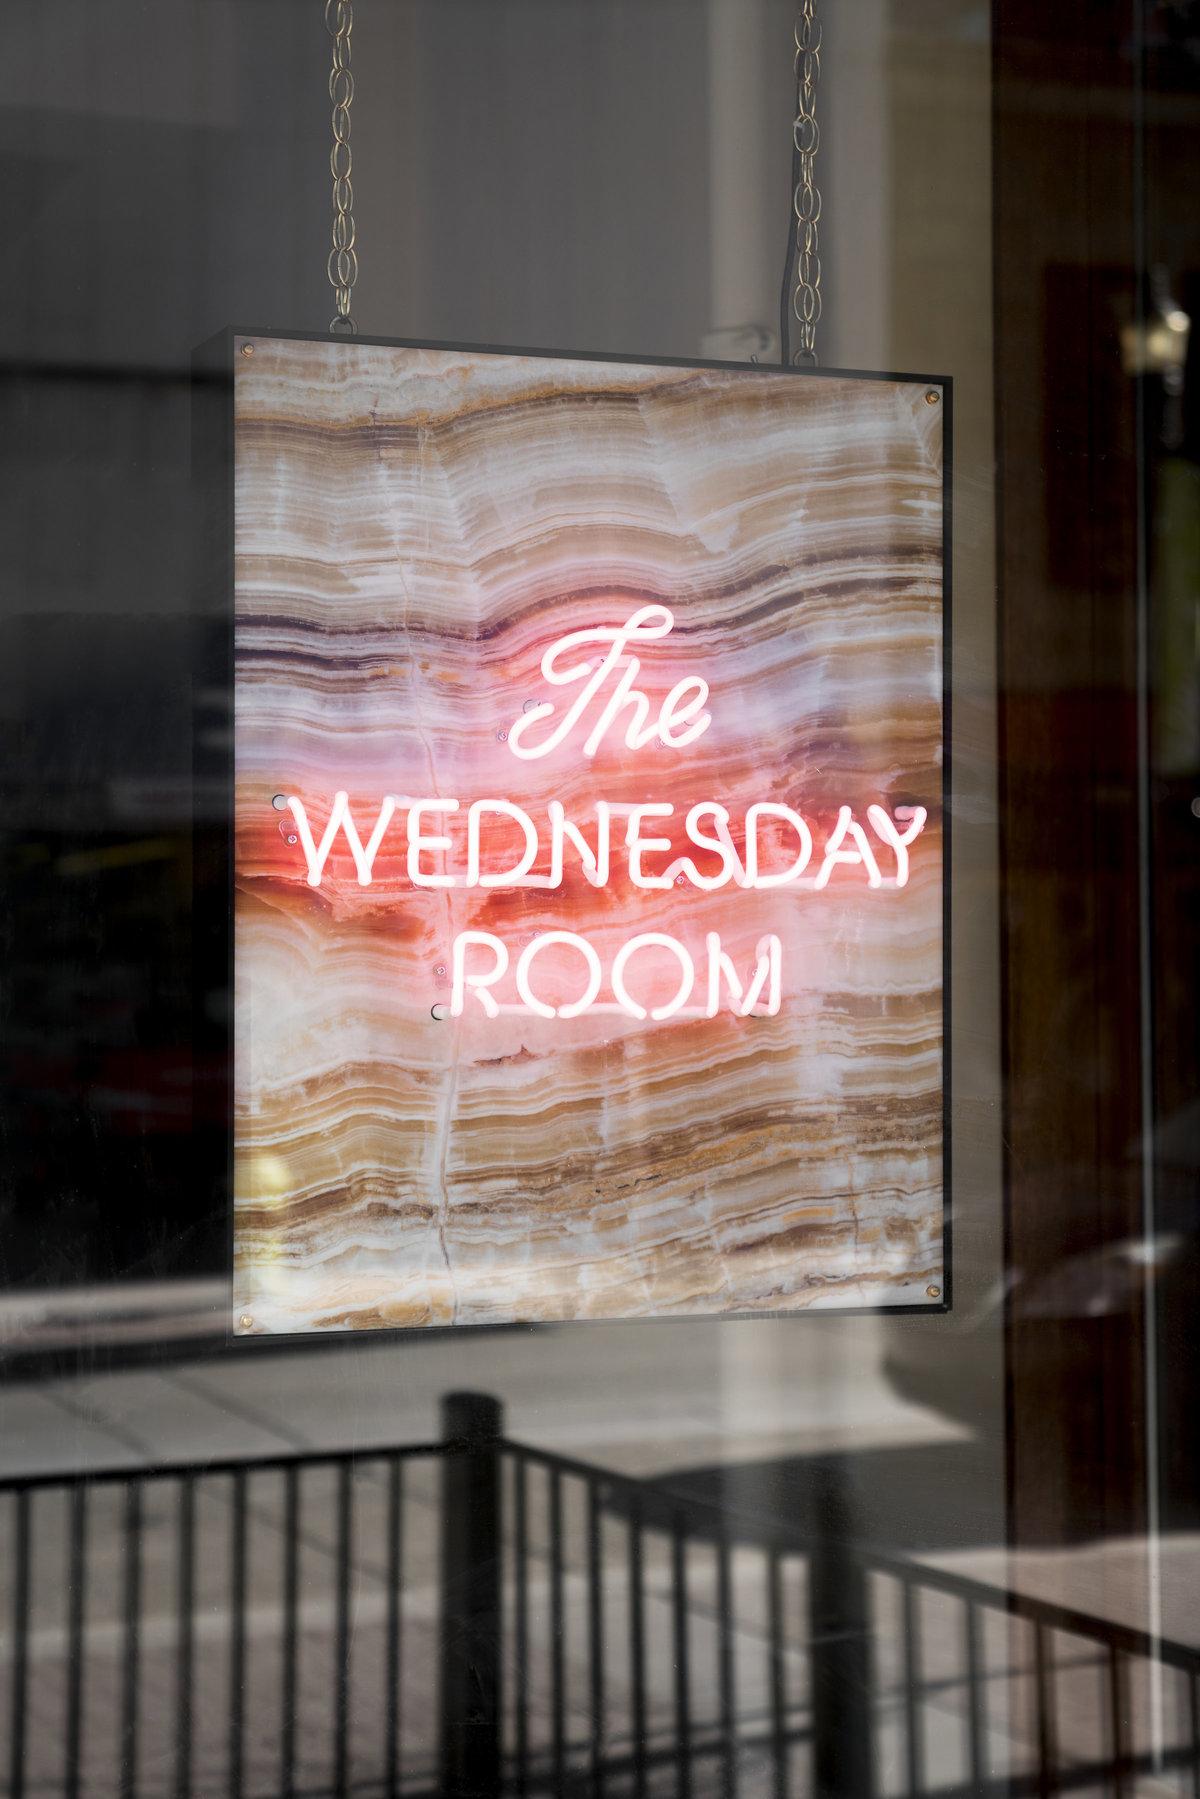 The Wednesday Room branding